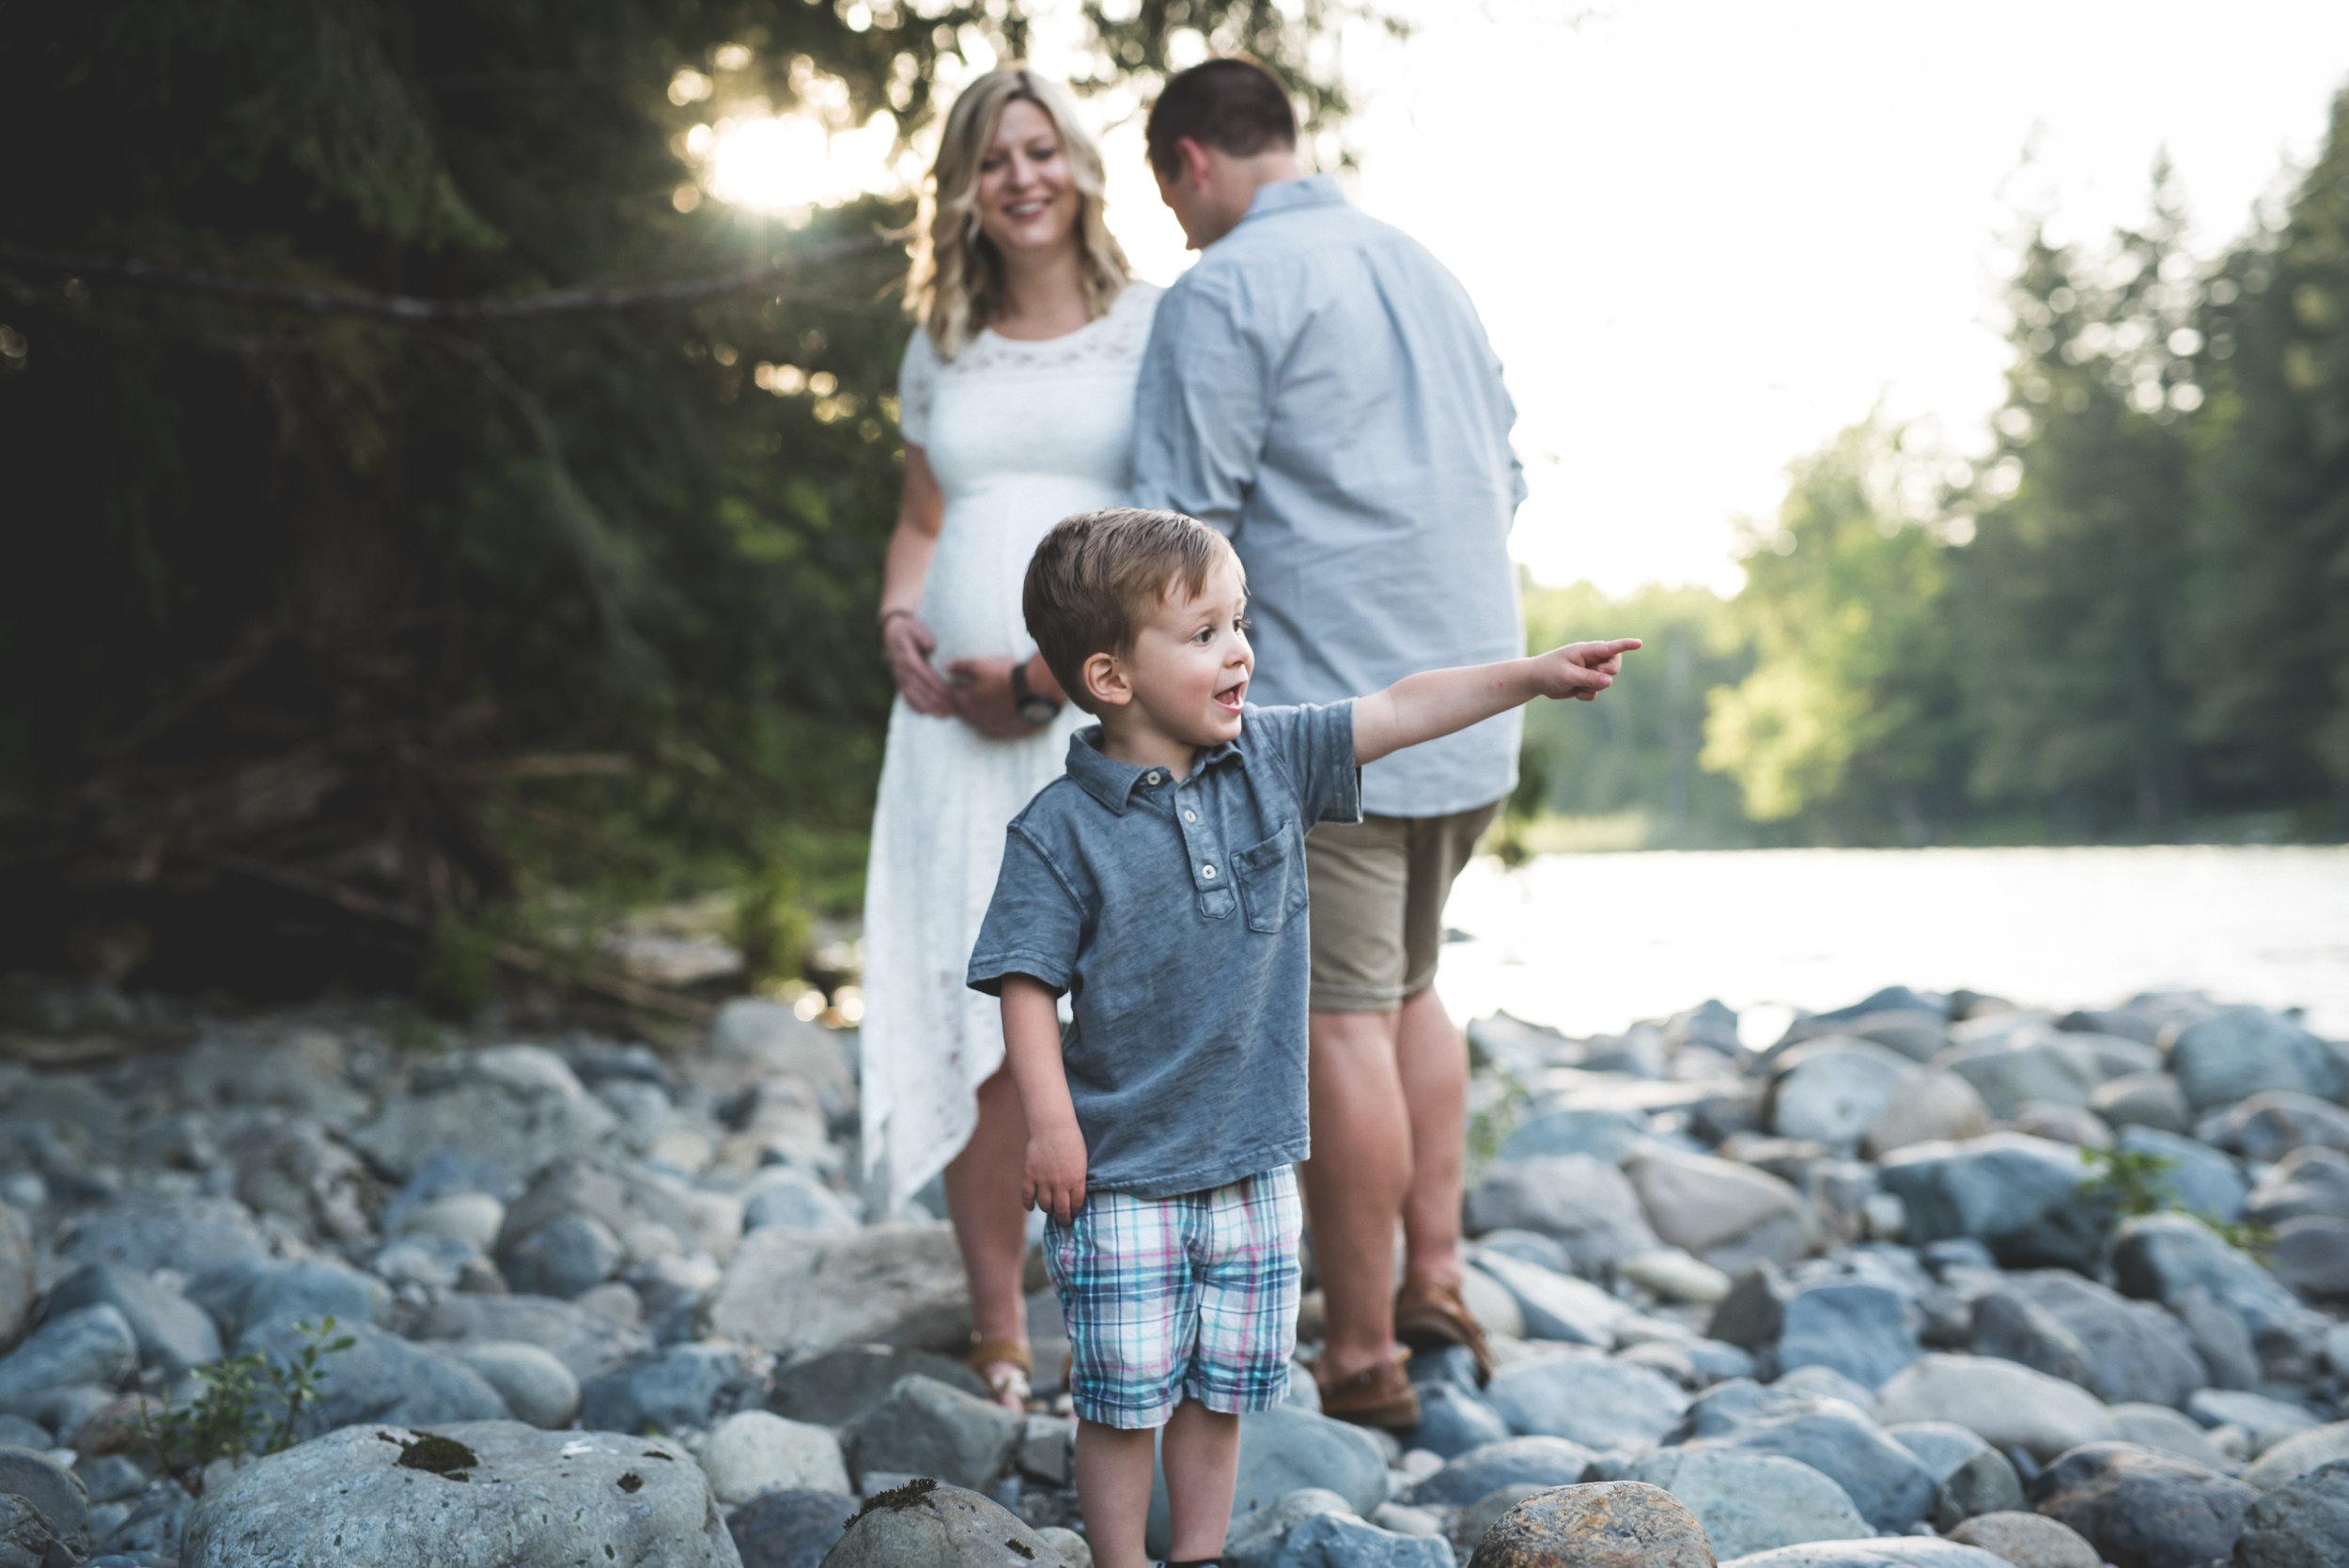 maternityphotos-kristingroverimages-3.jpg